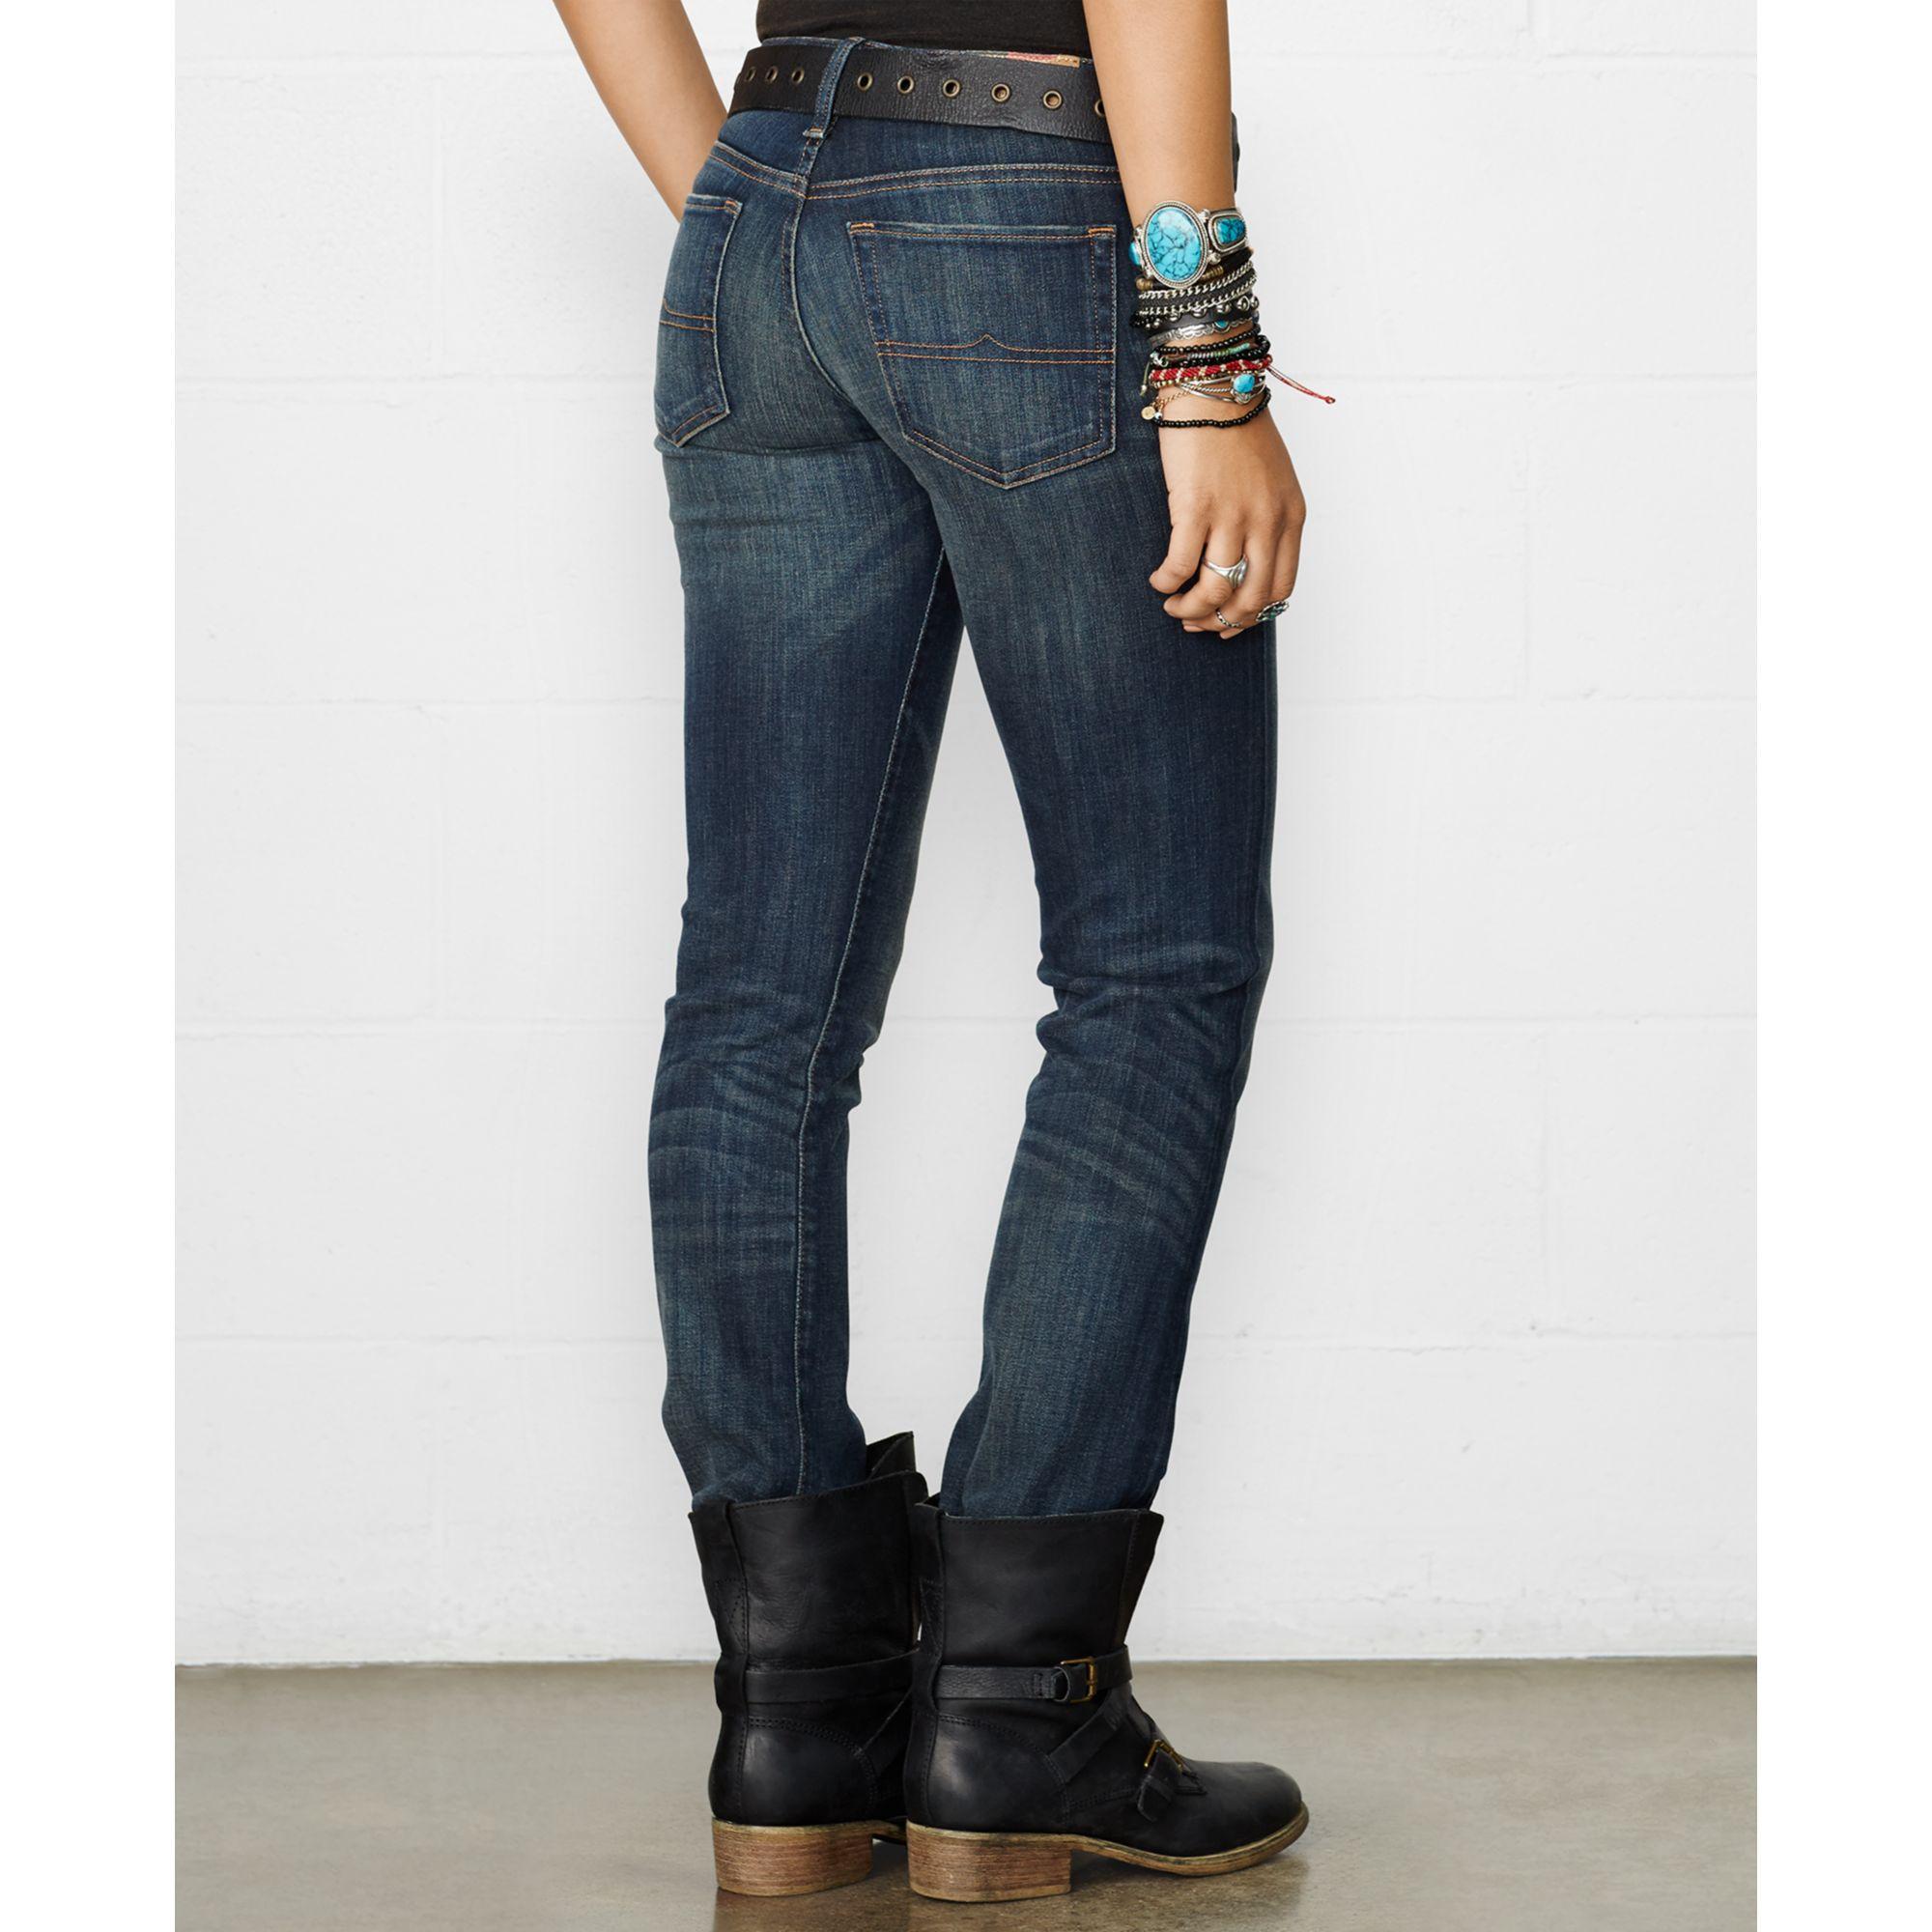 denim supply ralph lauren straight leg jeans aurora. Black Bedroom Furniture Sets. Home Design Ideas